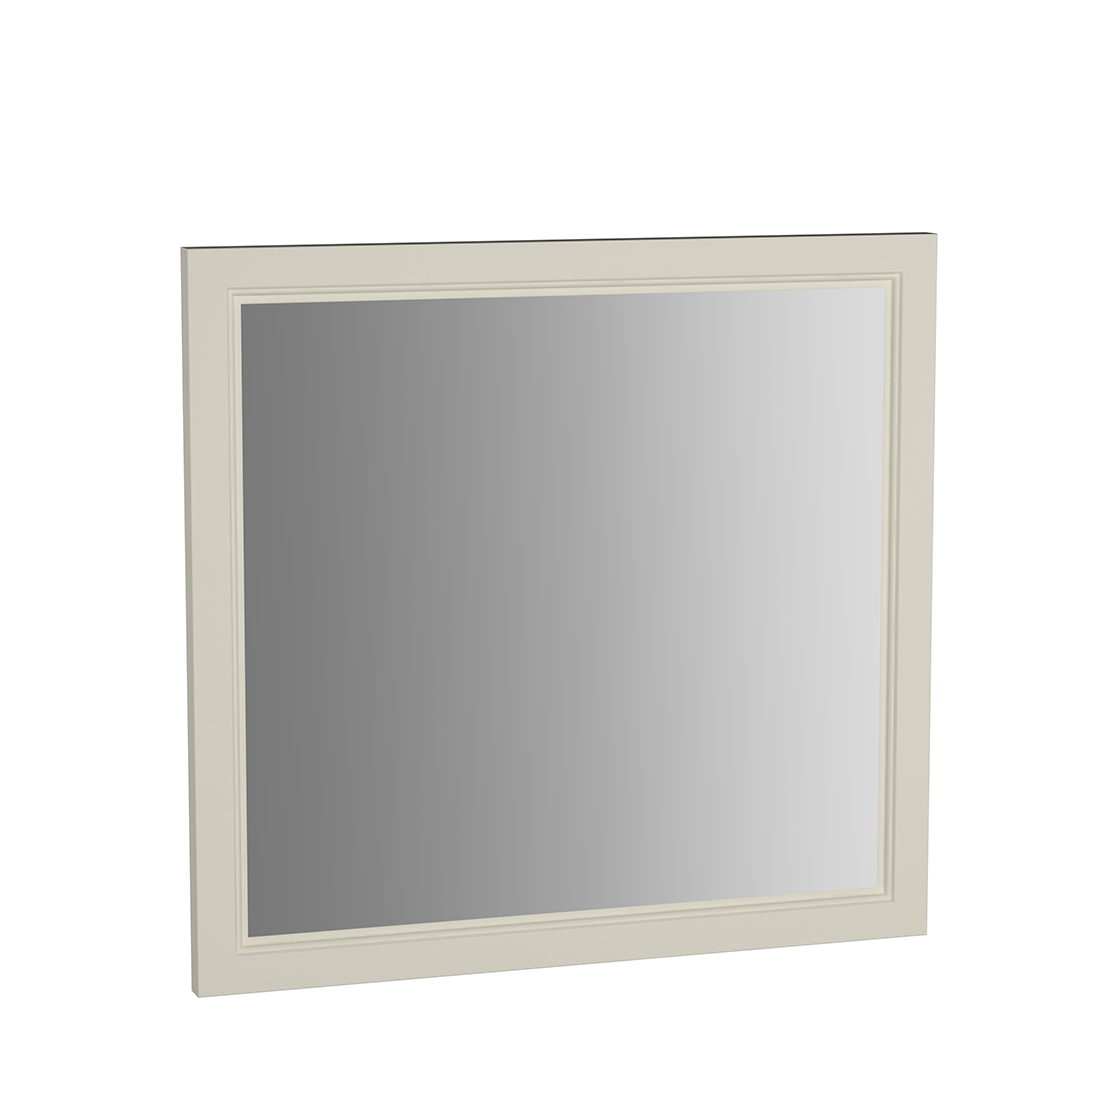 Valarte miroir, 80 cm, ivoire mat